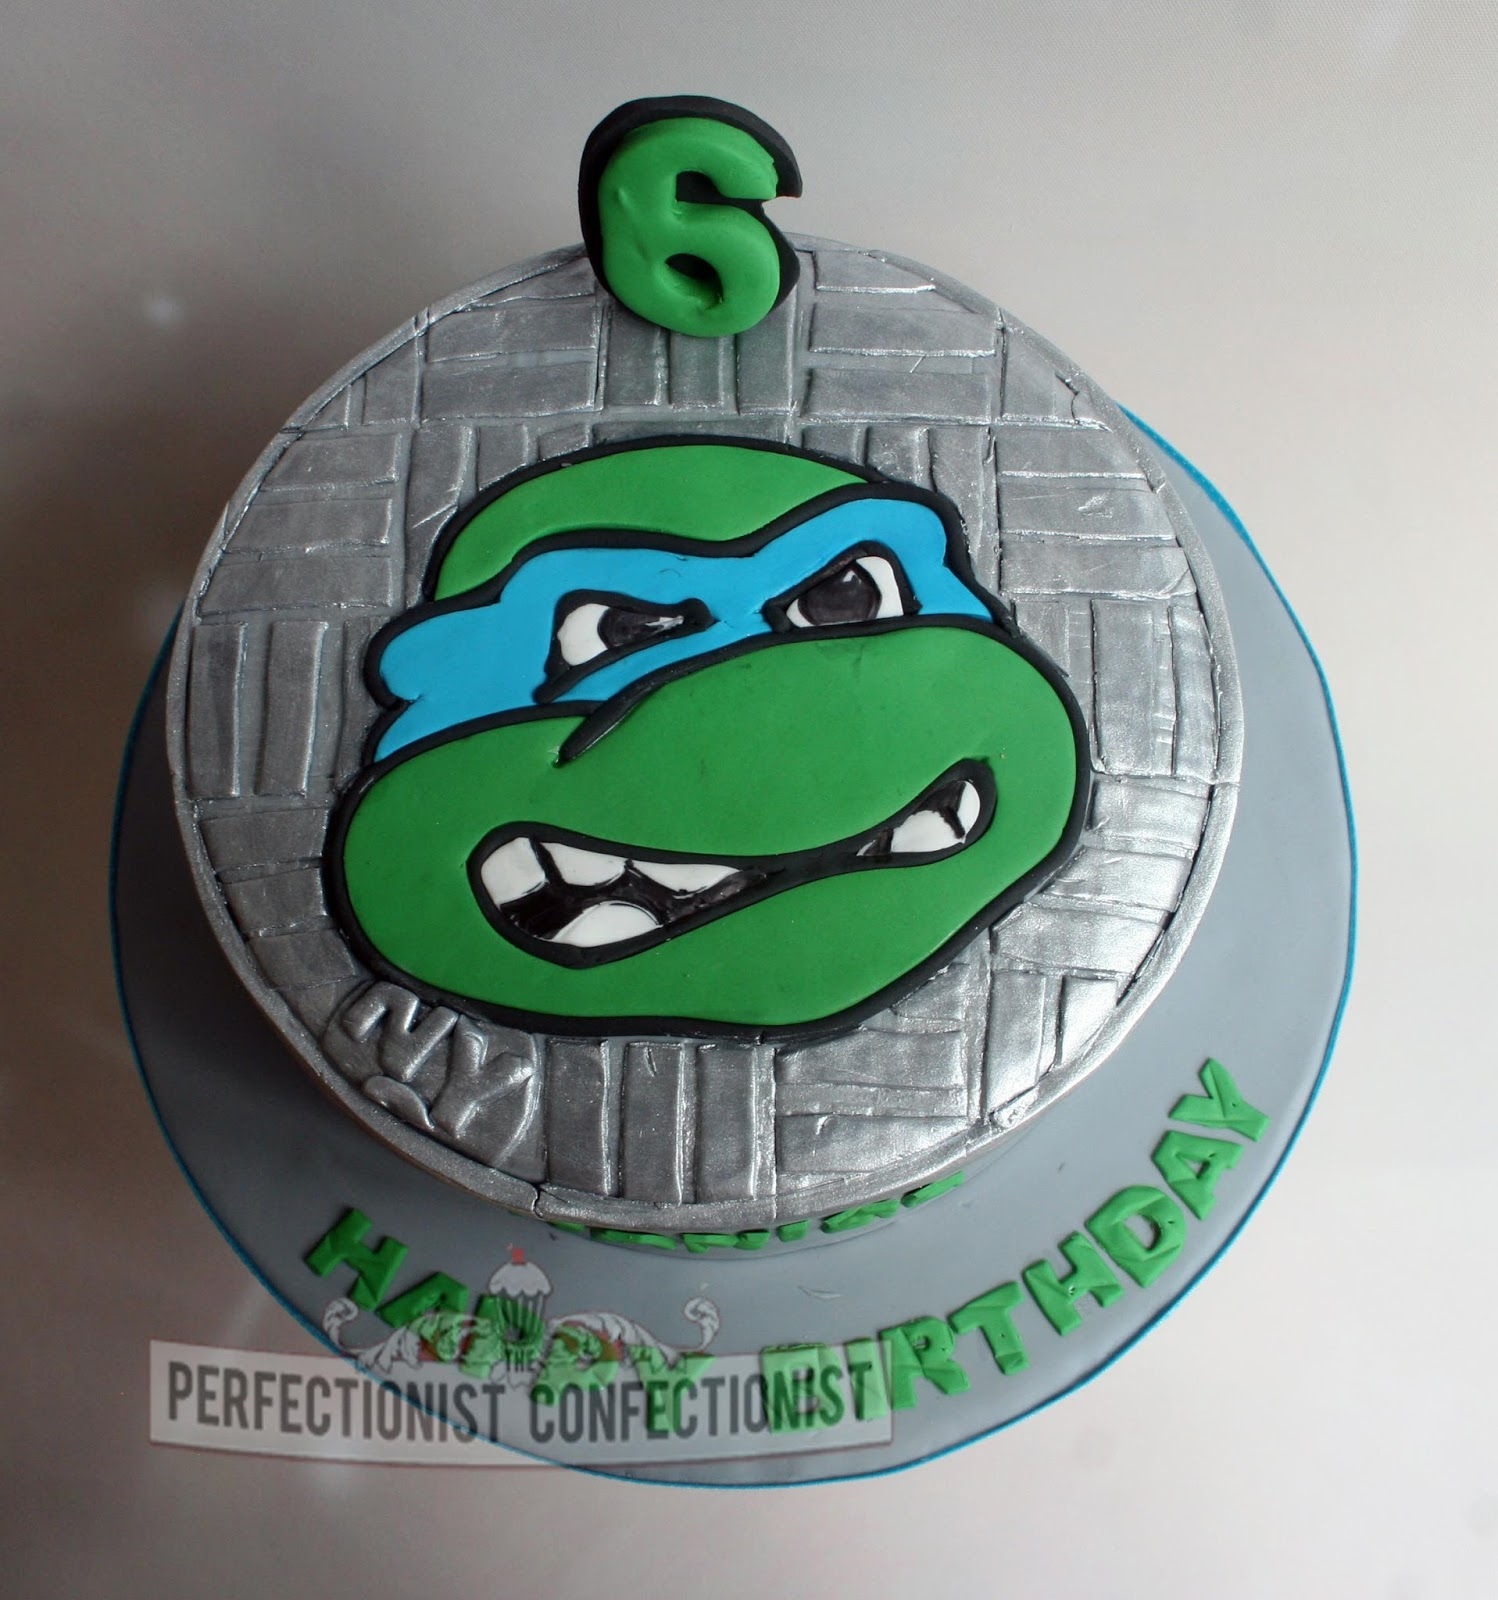 The Perfectionist Confectionist Daniel Ninja Turtle Cake